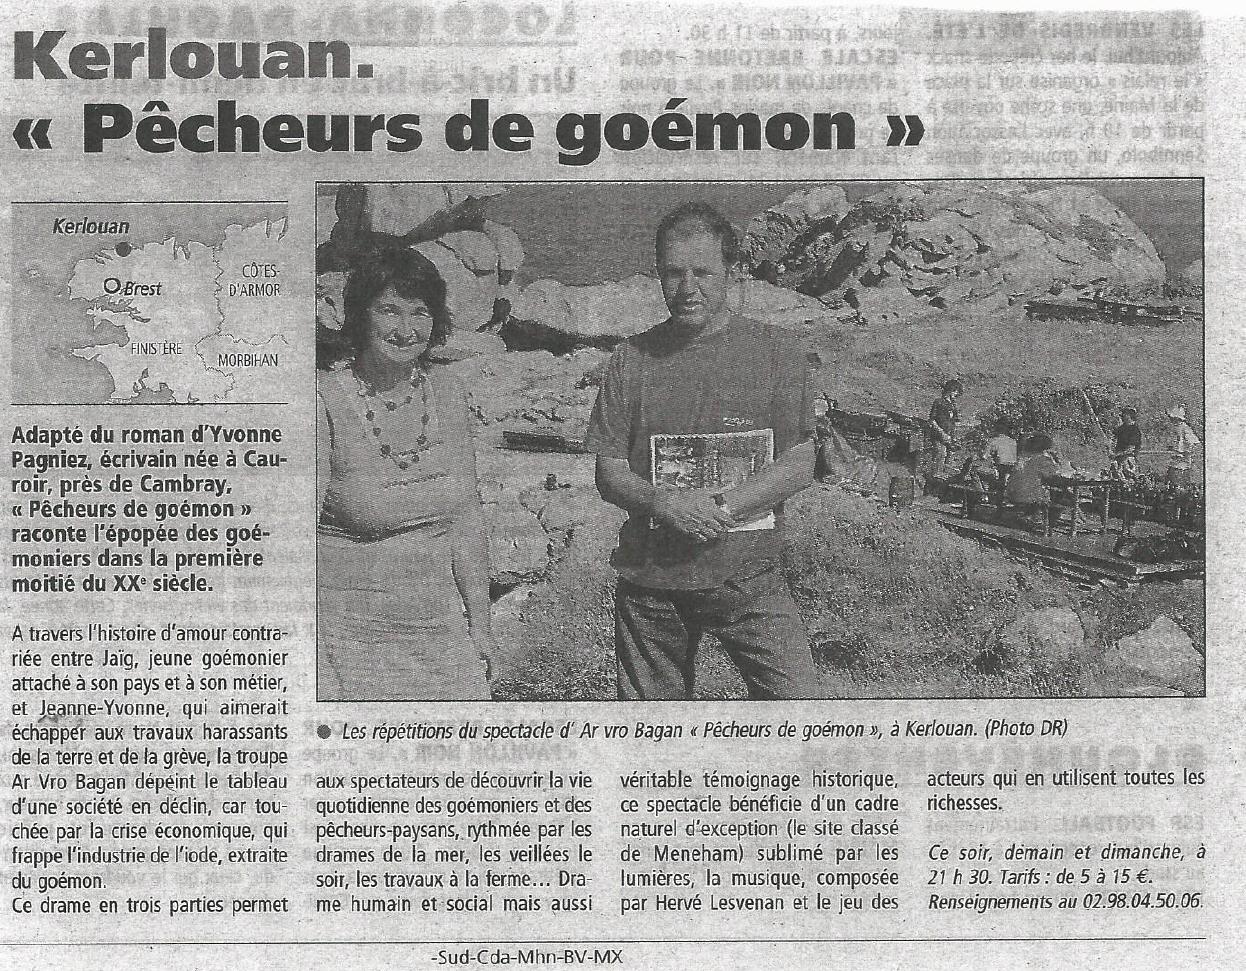 12_Hervé_Lesvenan_-_Ars'Ys_-_2005